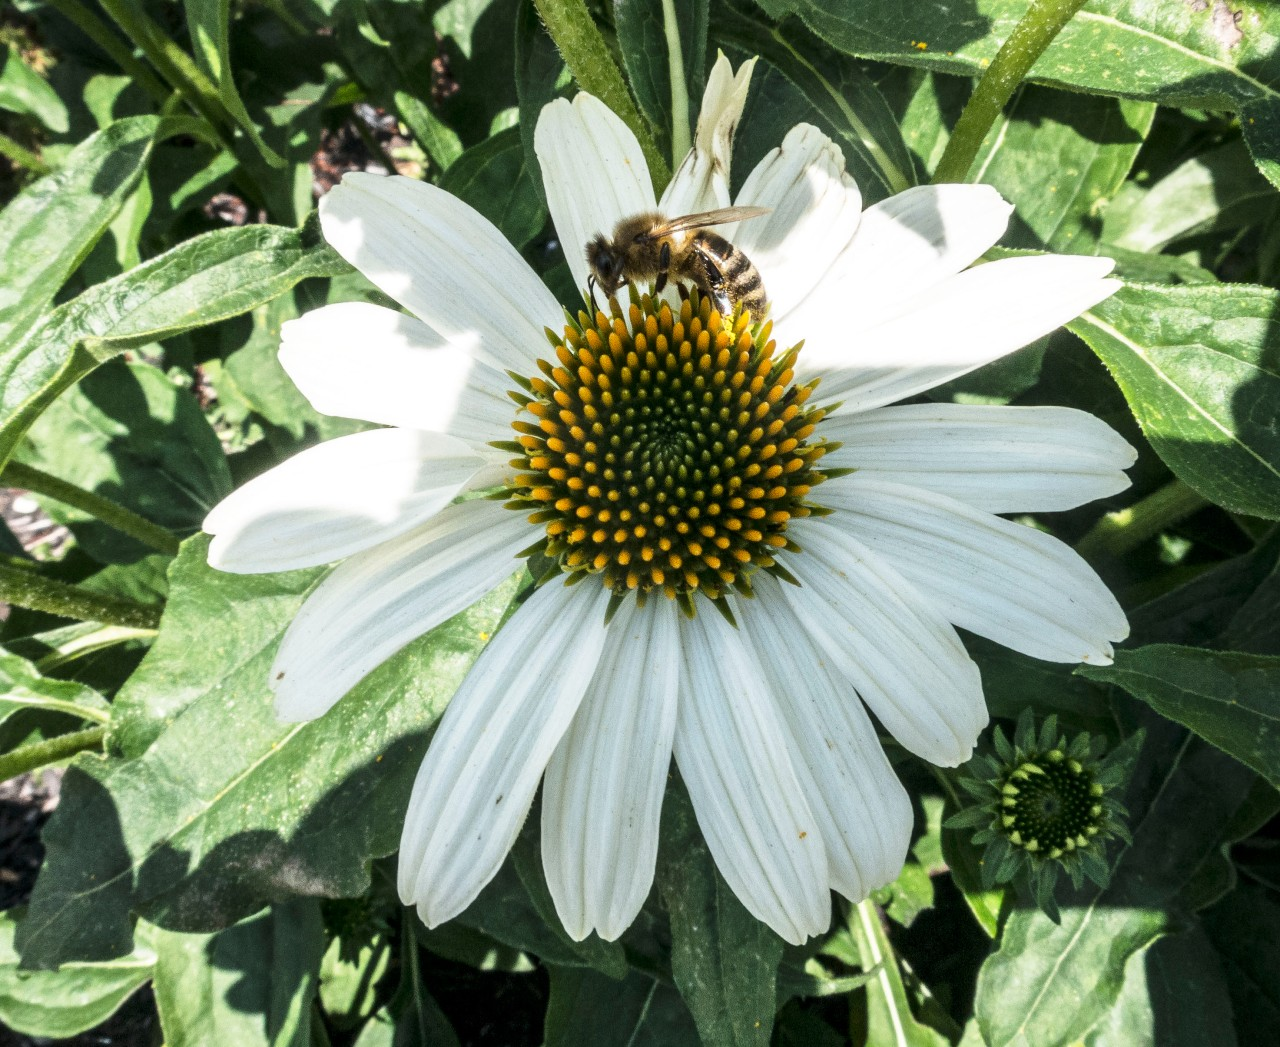 Saturday's Flower